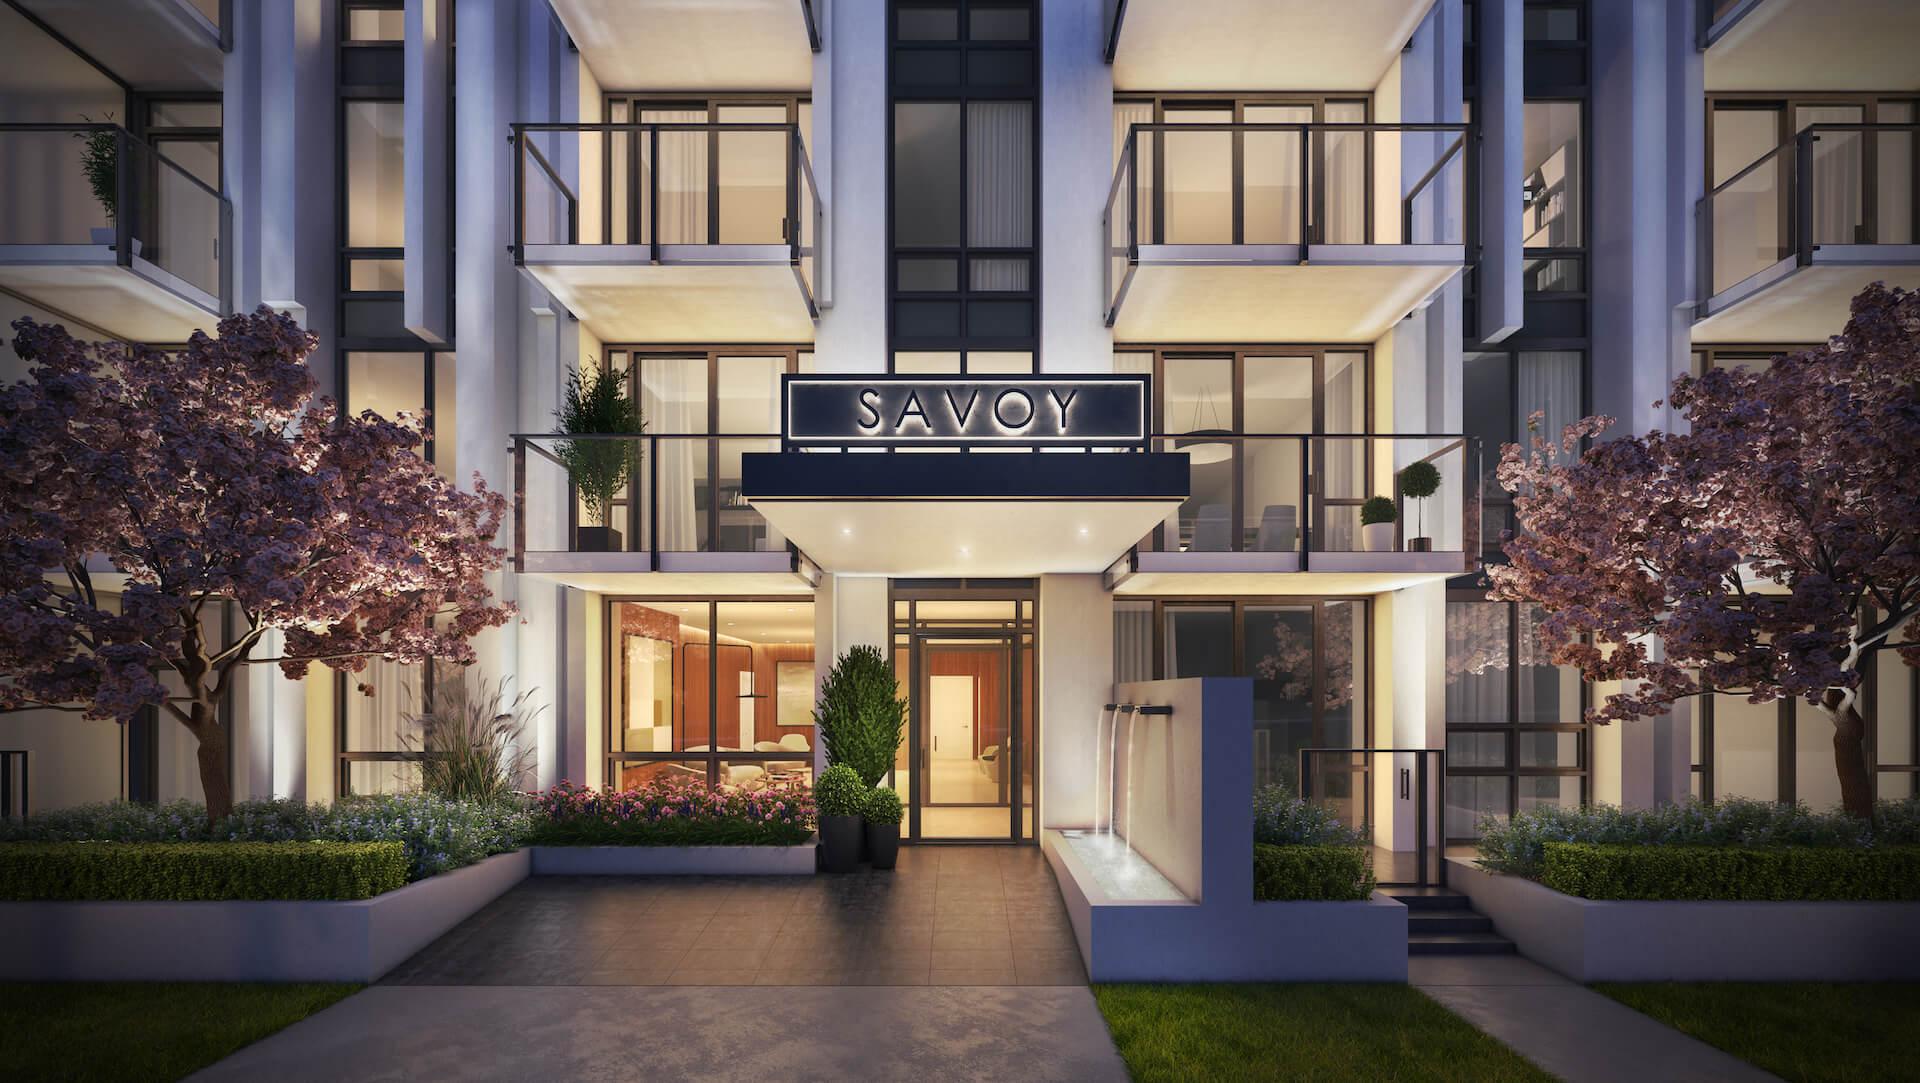 Savoy - Entrance